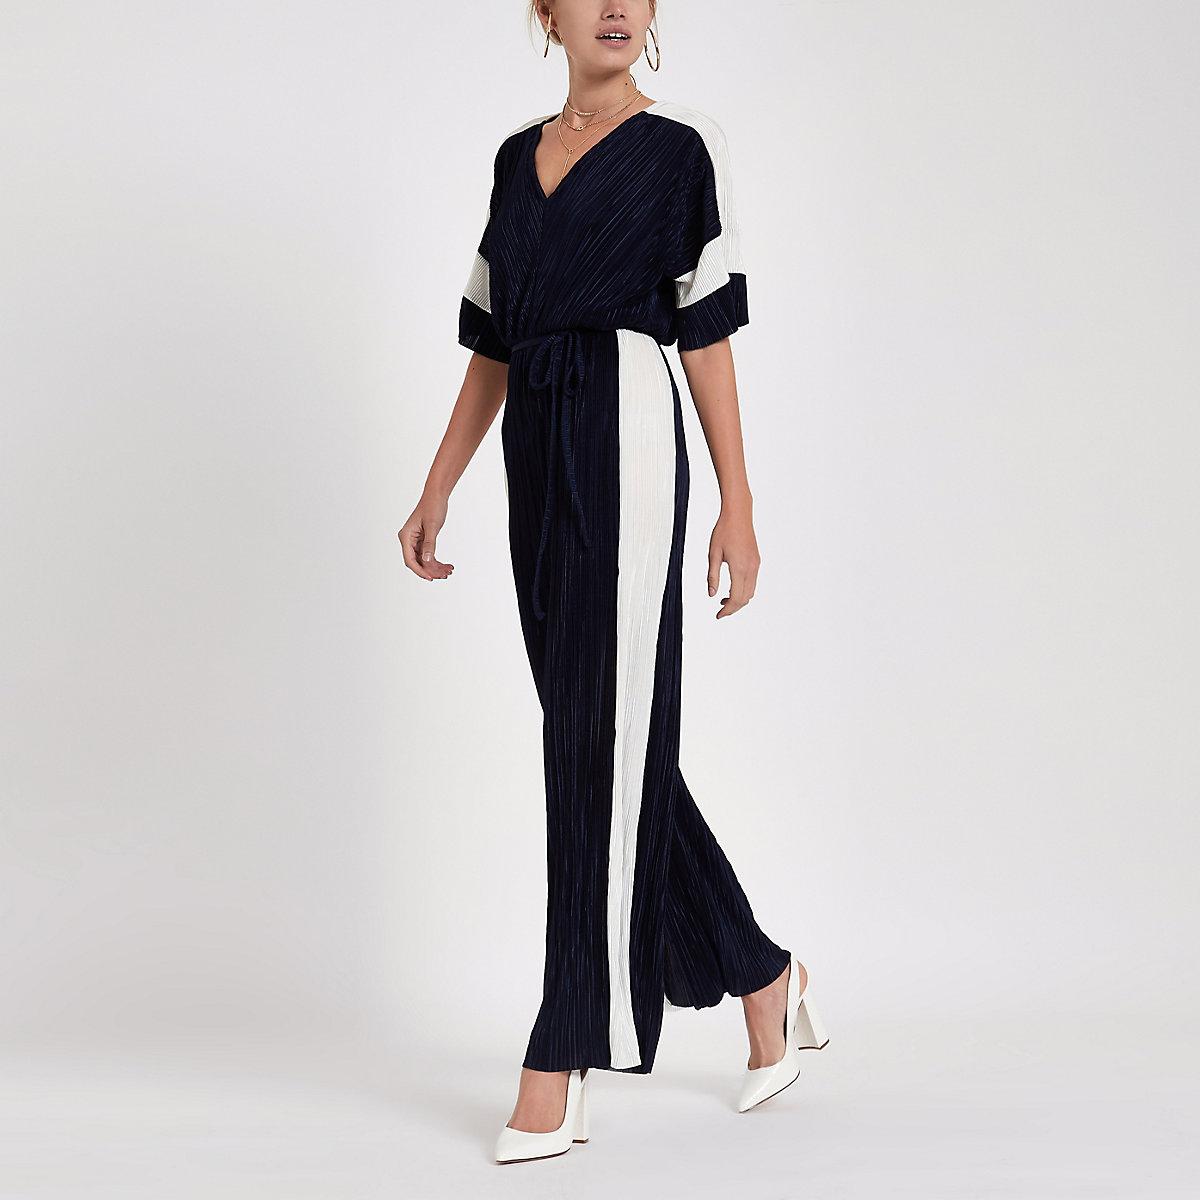 3384defc3becd Navy plisse V neck wide leg jumpsuit - Race Day Dresses   Outfits - women